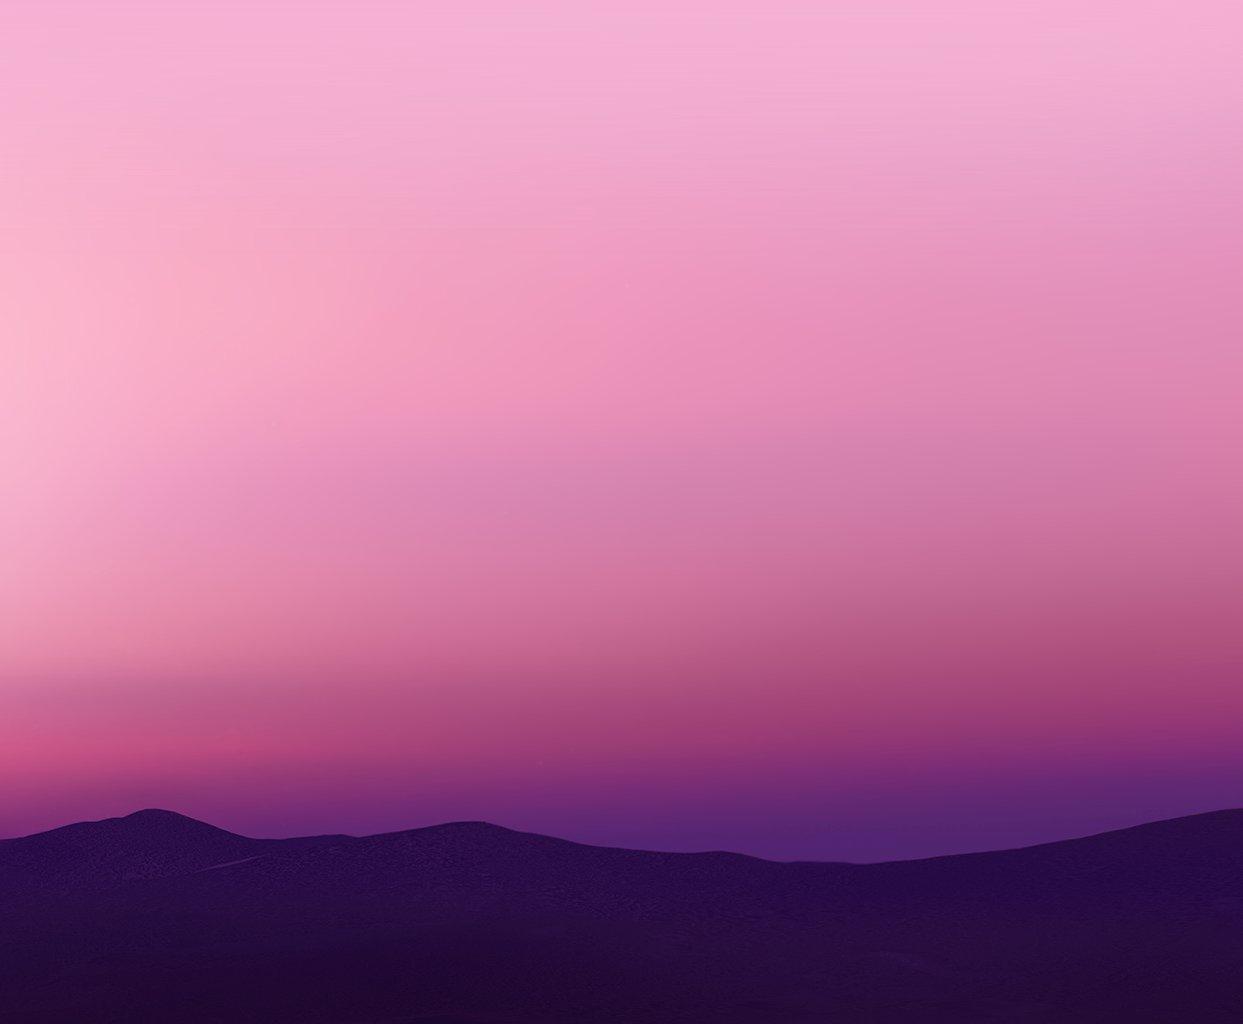 android sfondo pink sky